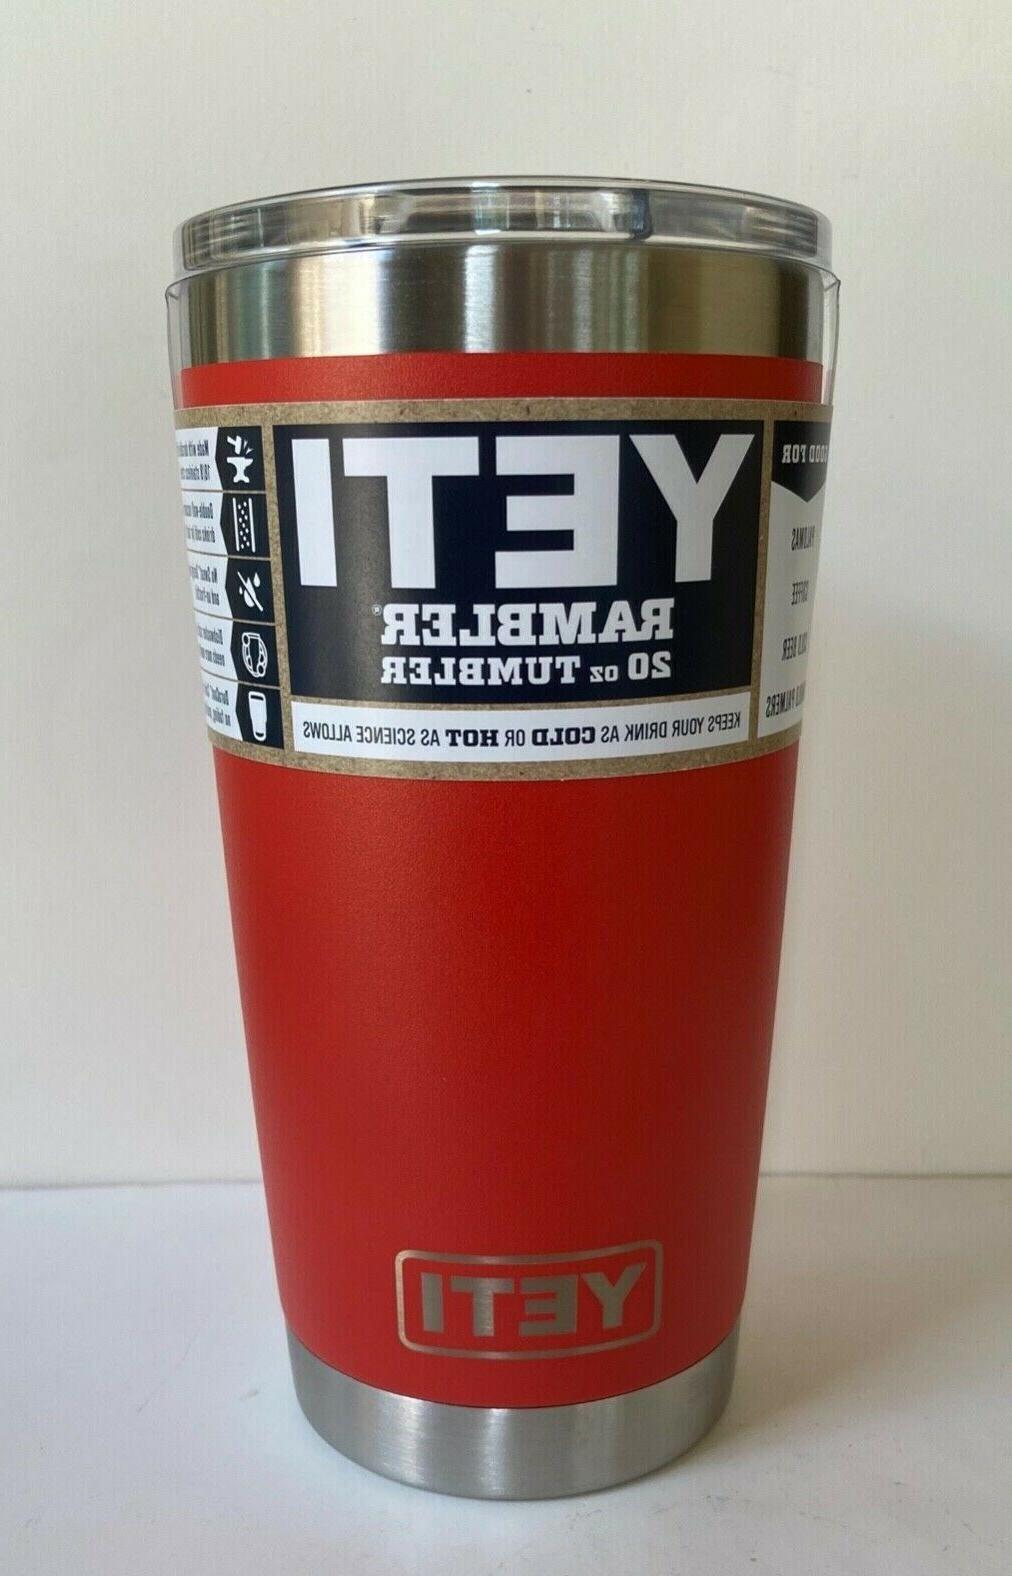 YETI 20 , Stainless Steel Vacuum Insulated with Li